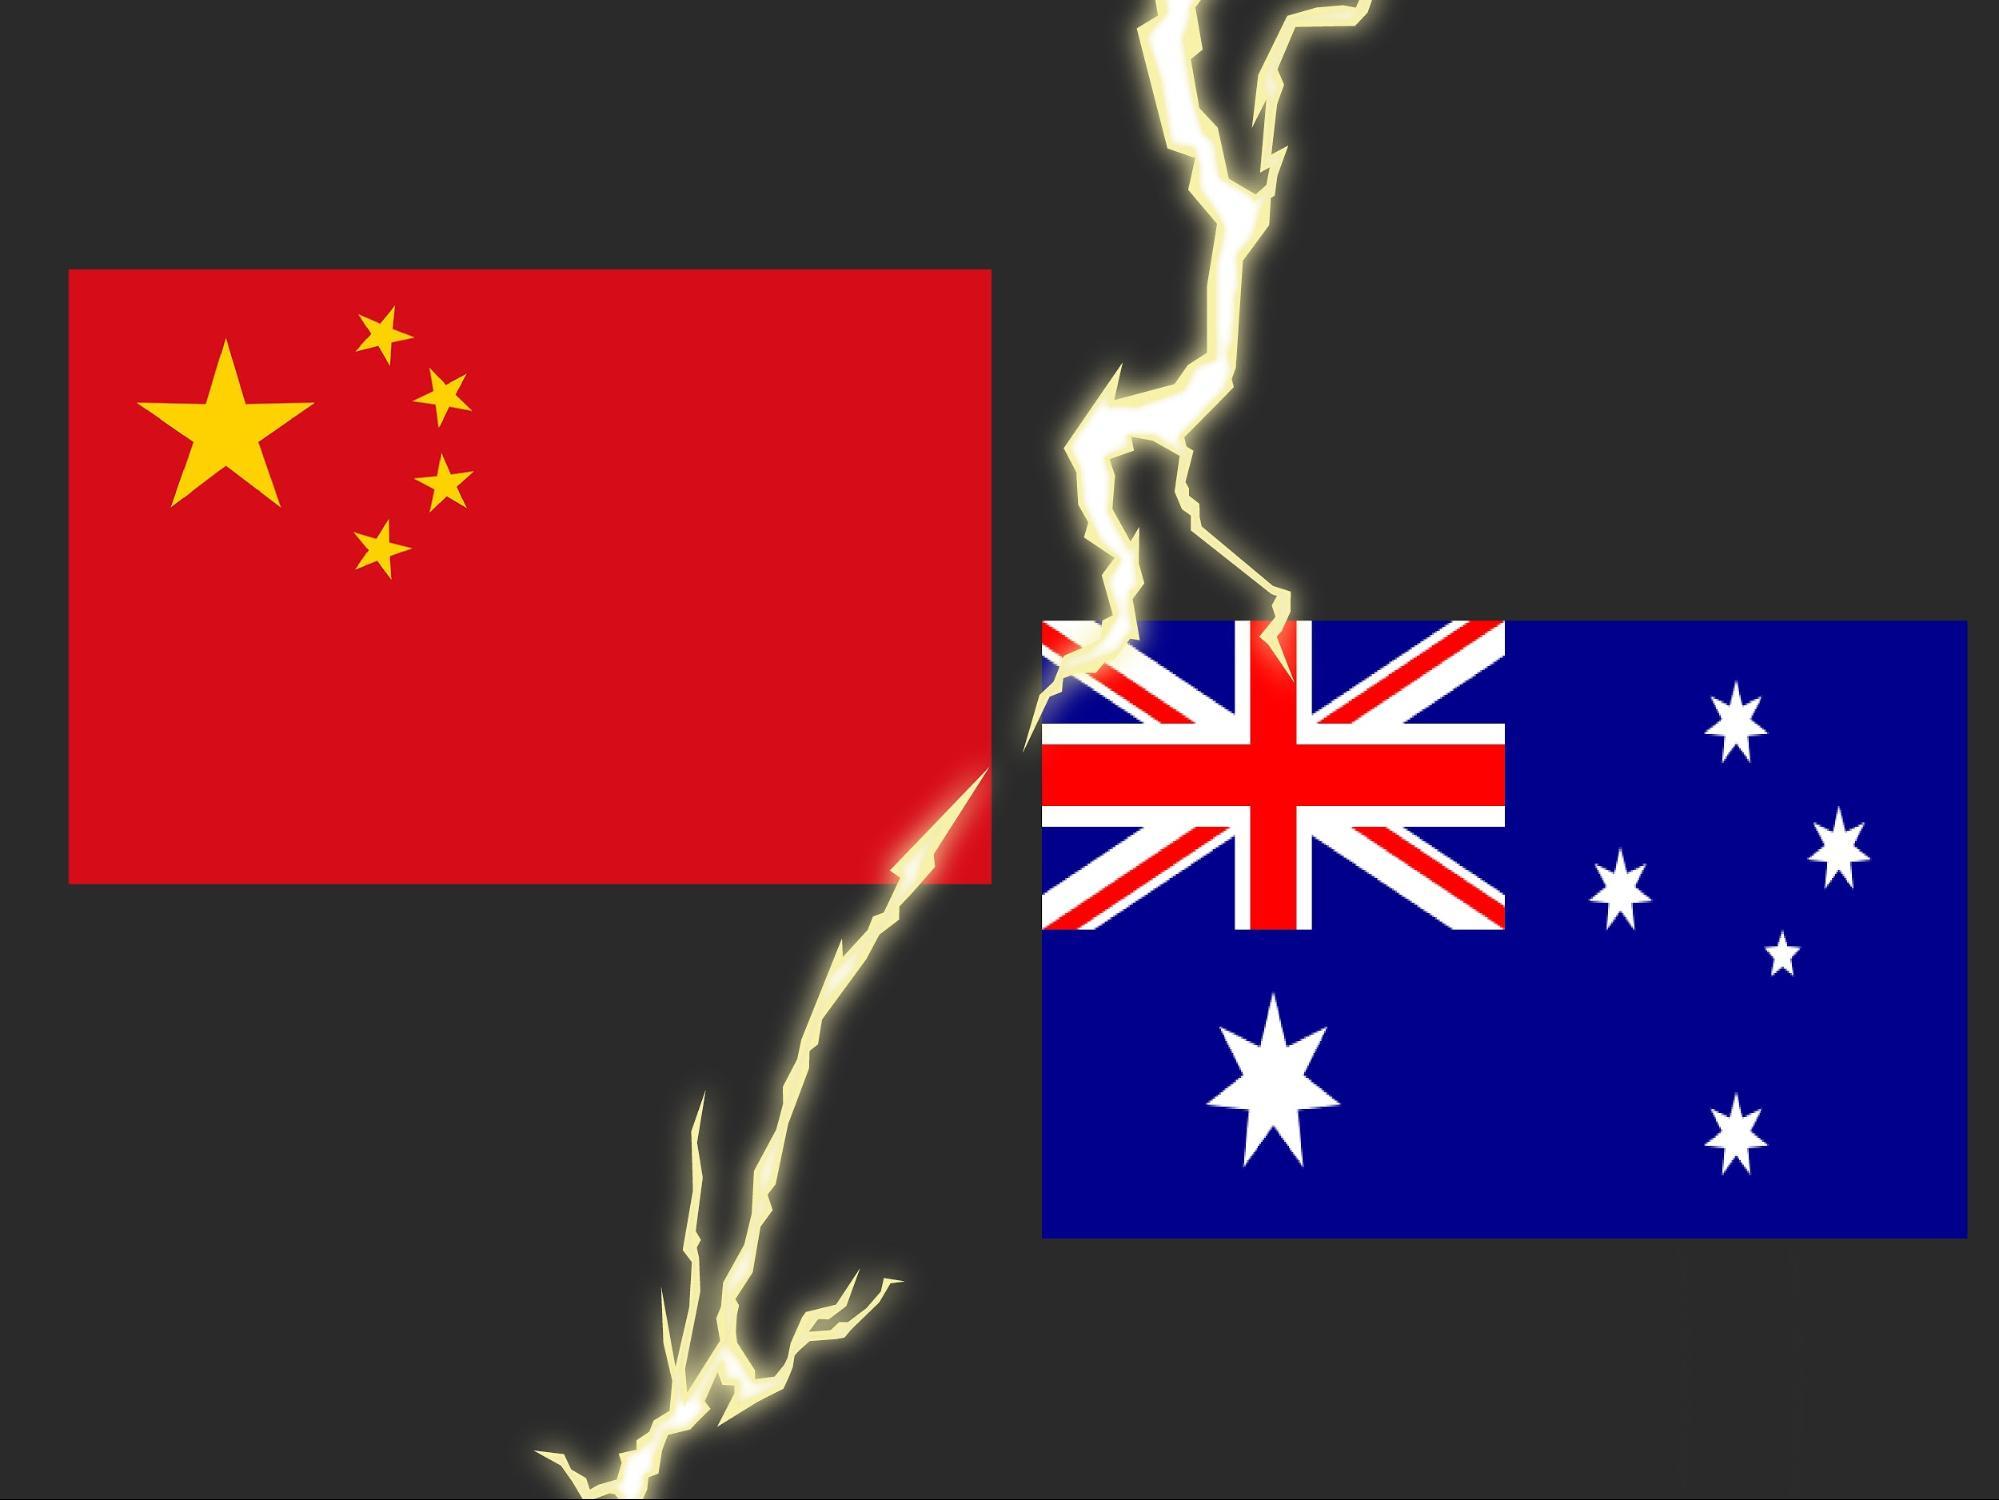 FX_豪ドル_AUD_中国との関係悪化